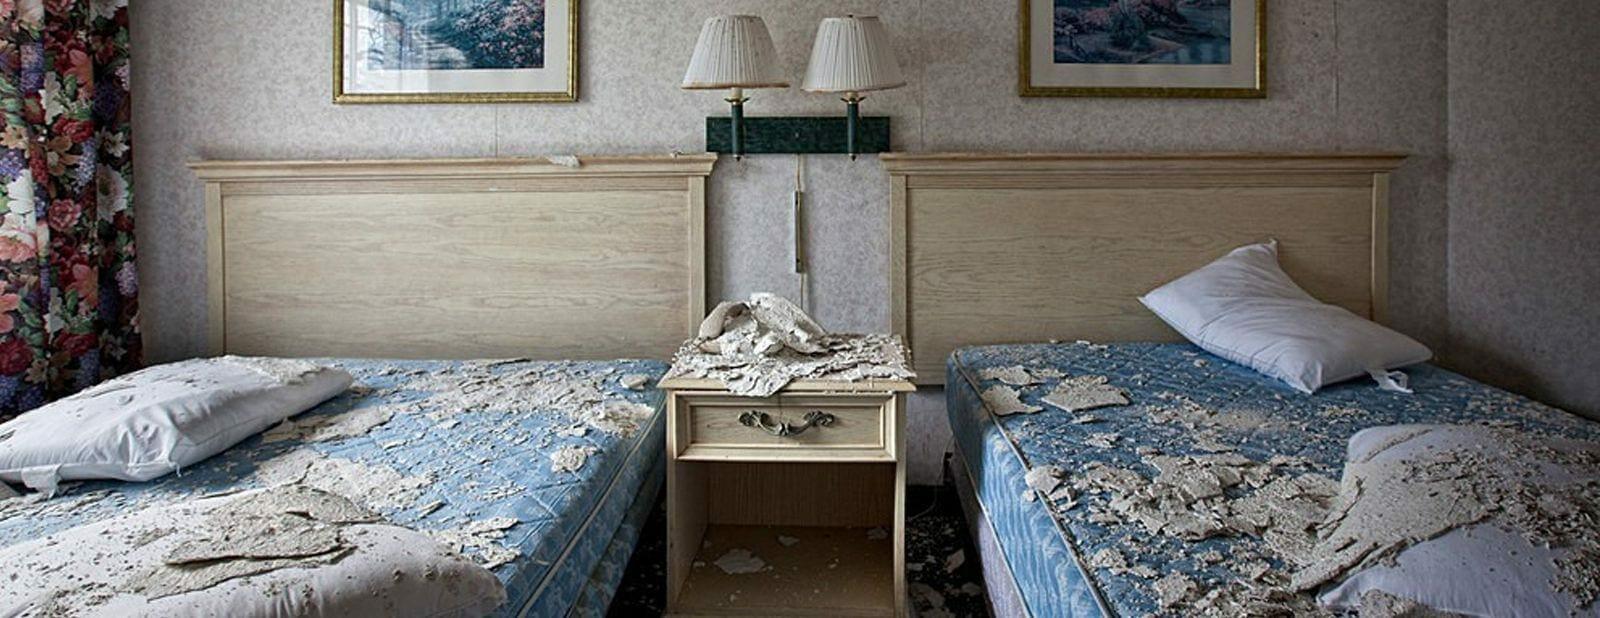 Abandoned America Fallside Hotel